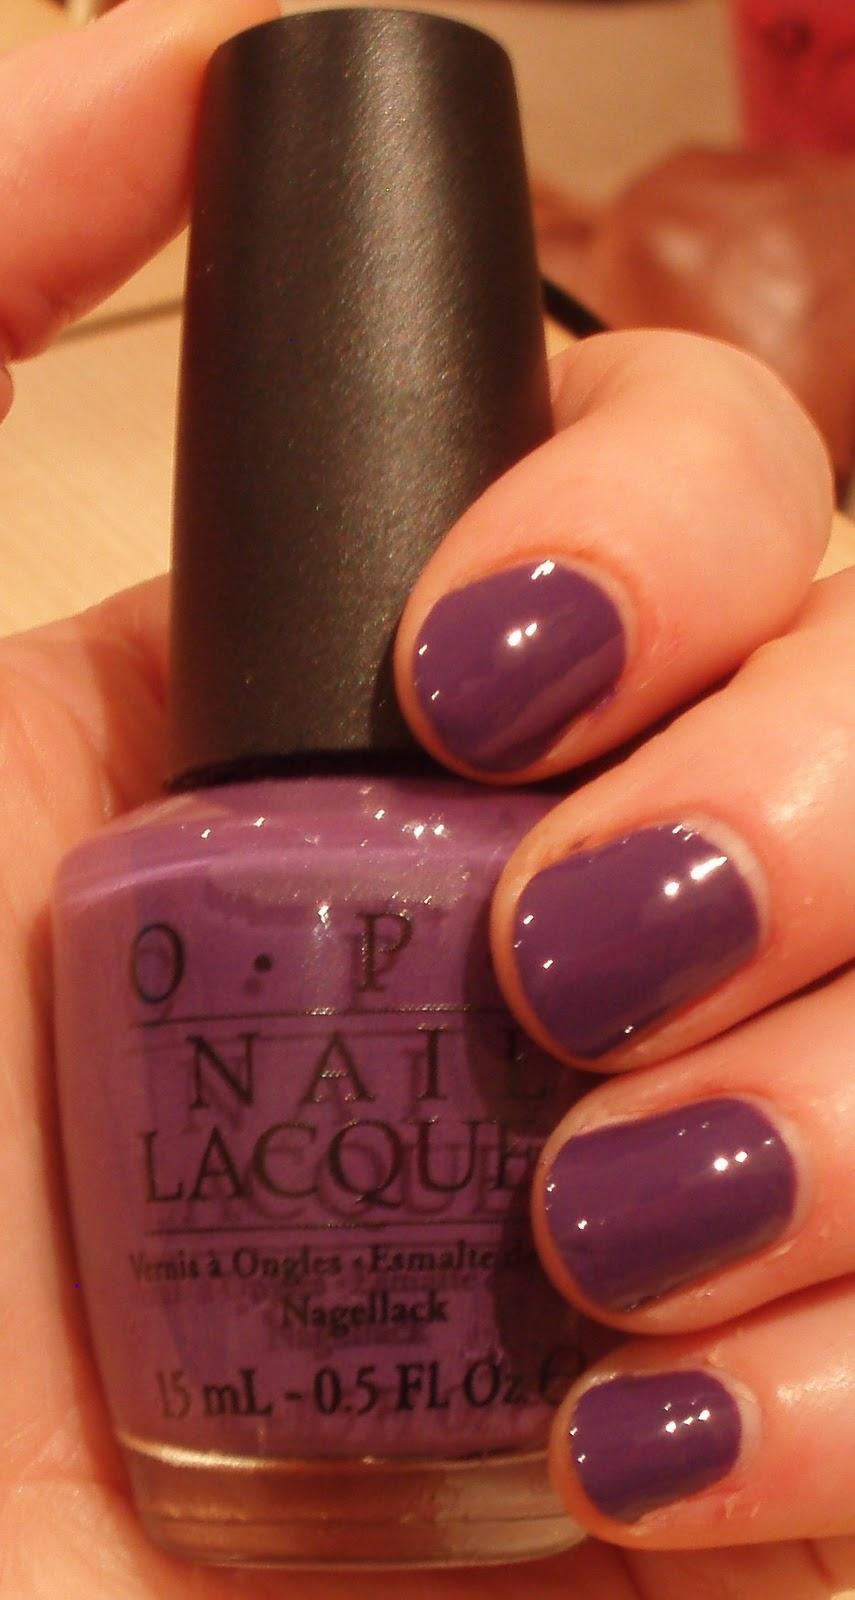 Snowdrop85: Haul - The Nail Polish Kind!